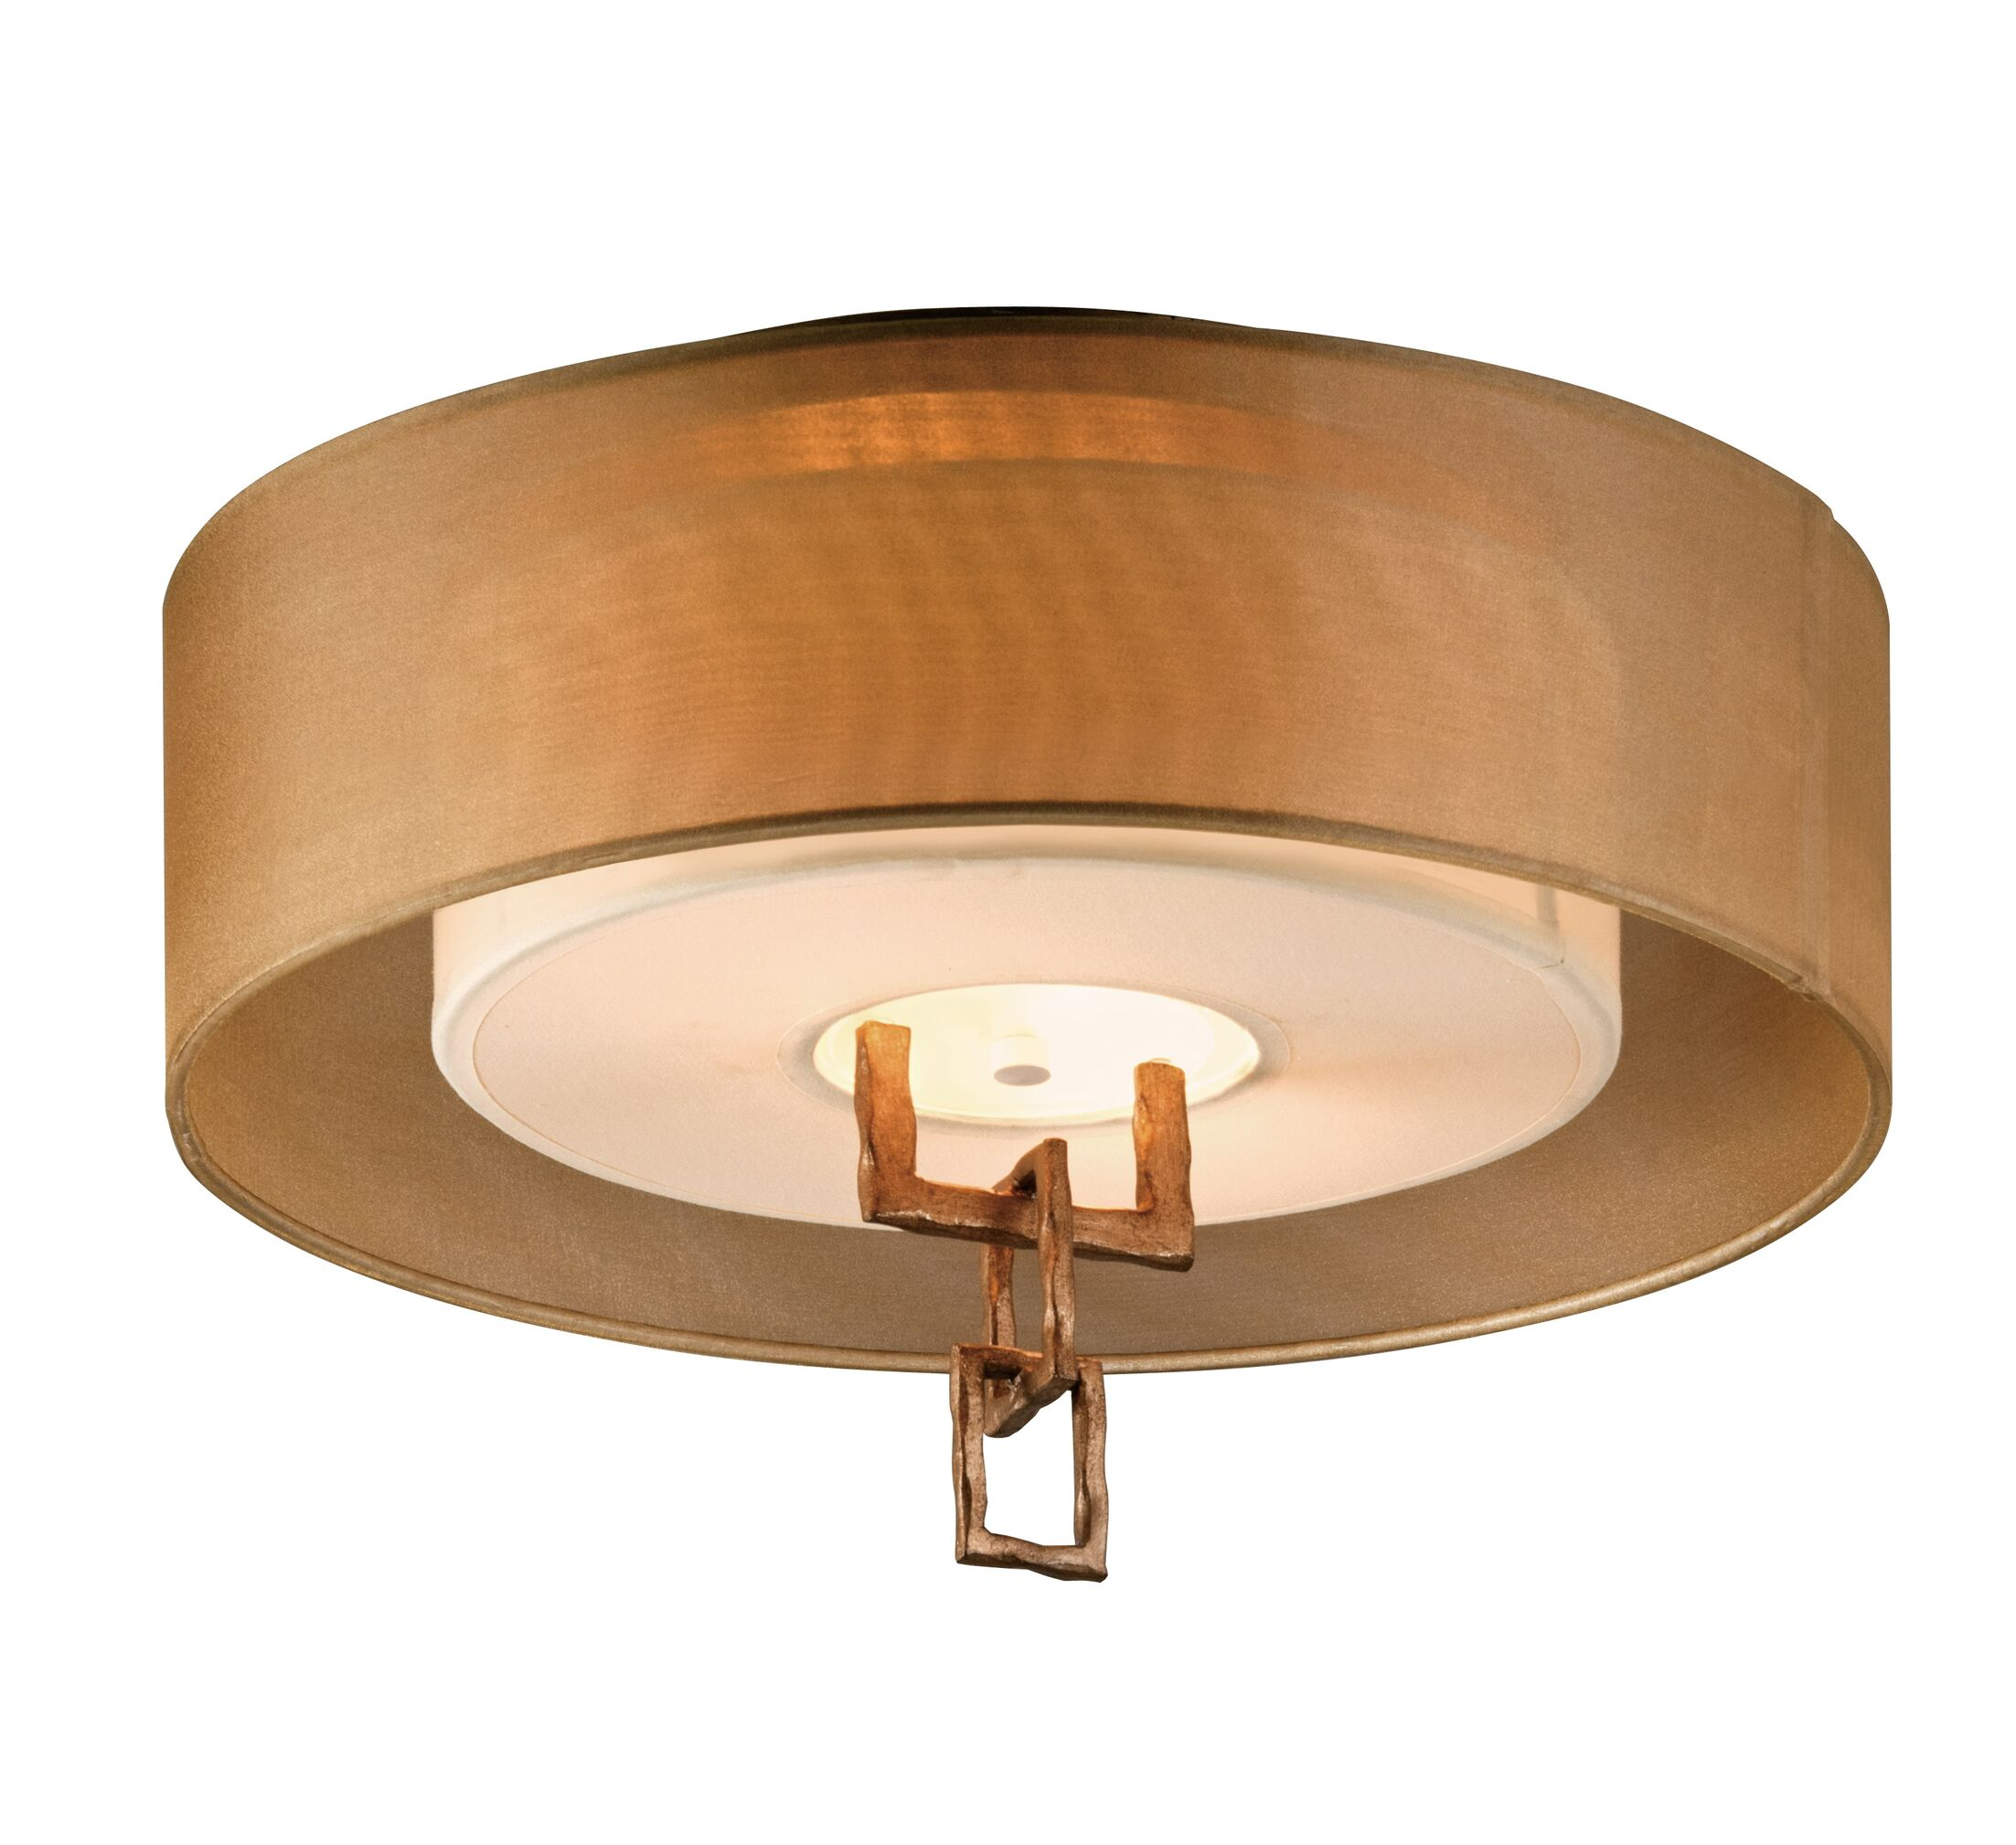 Karissa 2-Light Semi-Flush Mount Bulb Type: 13W Gu24 Fluorescent Bulb